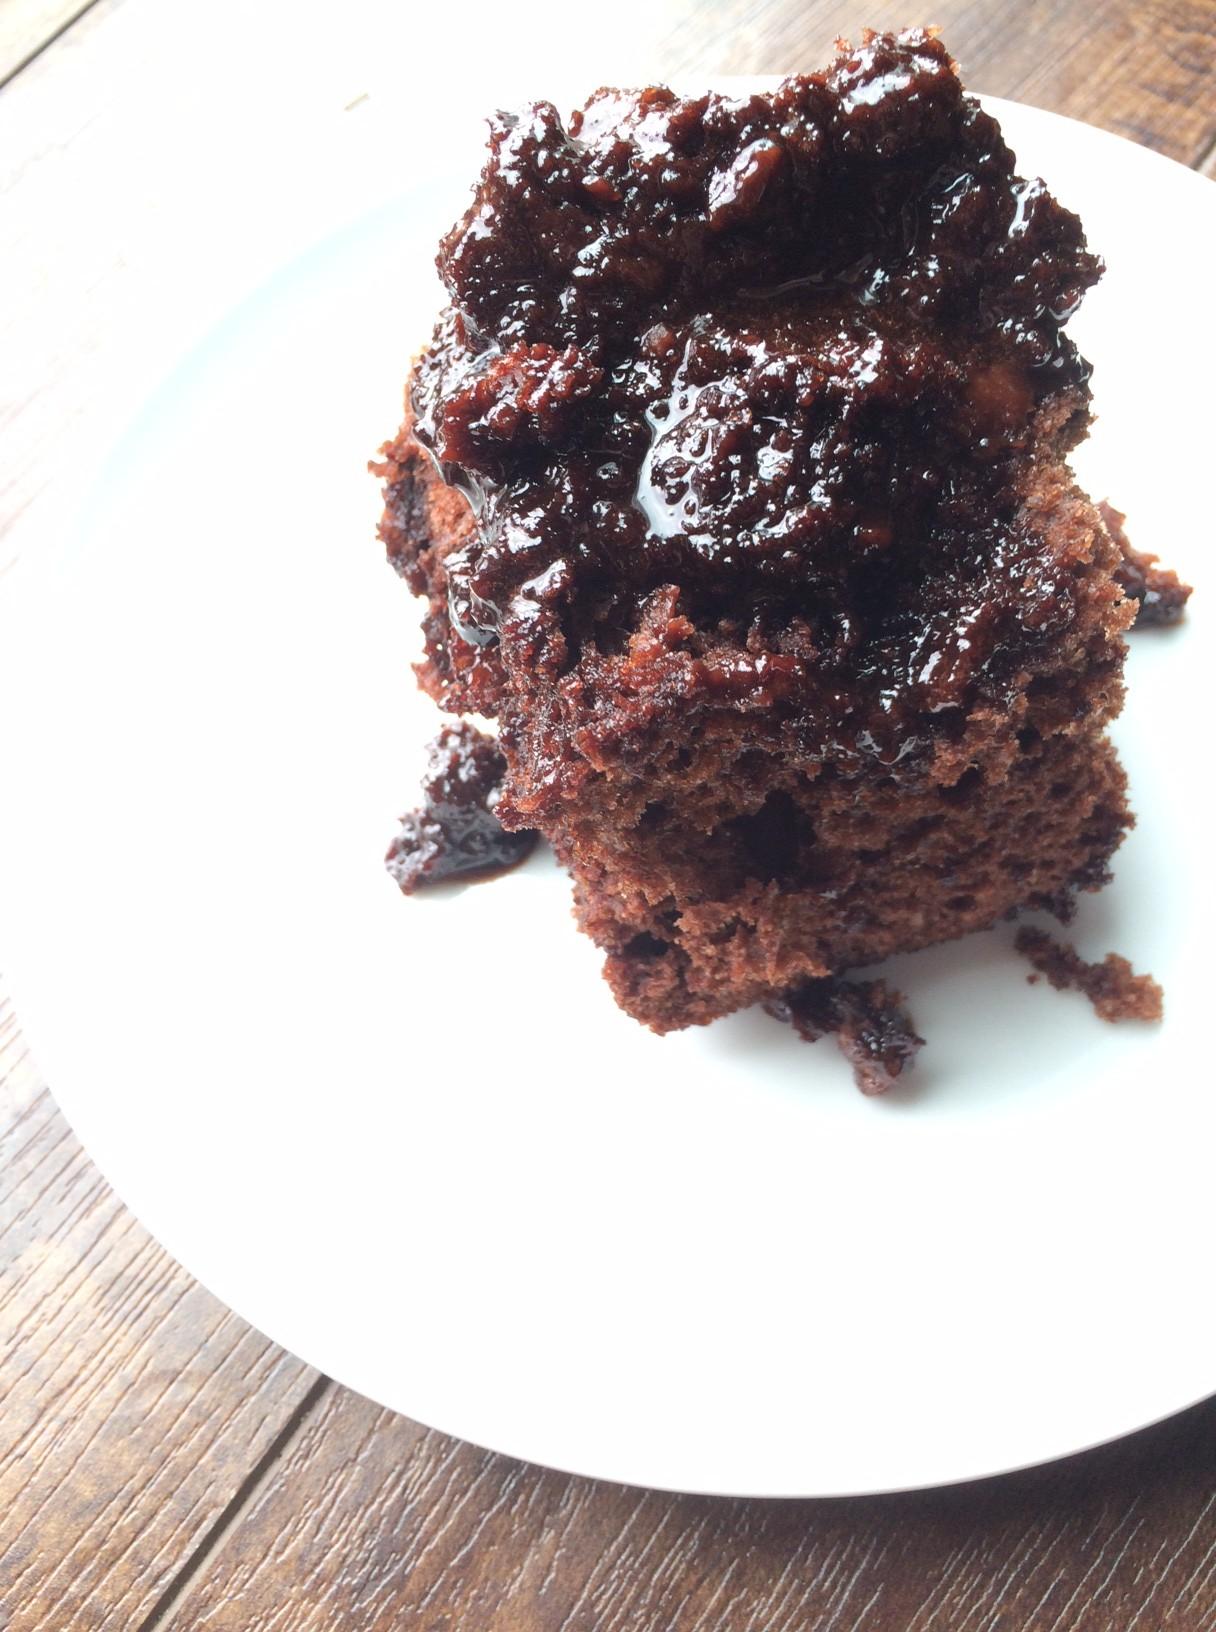 Microwave Chocolate Lava Cake